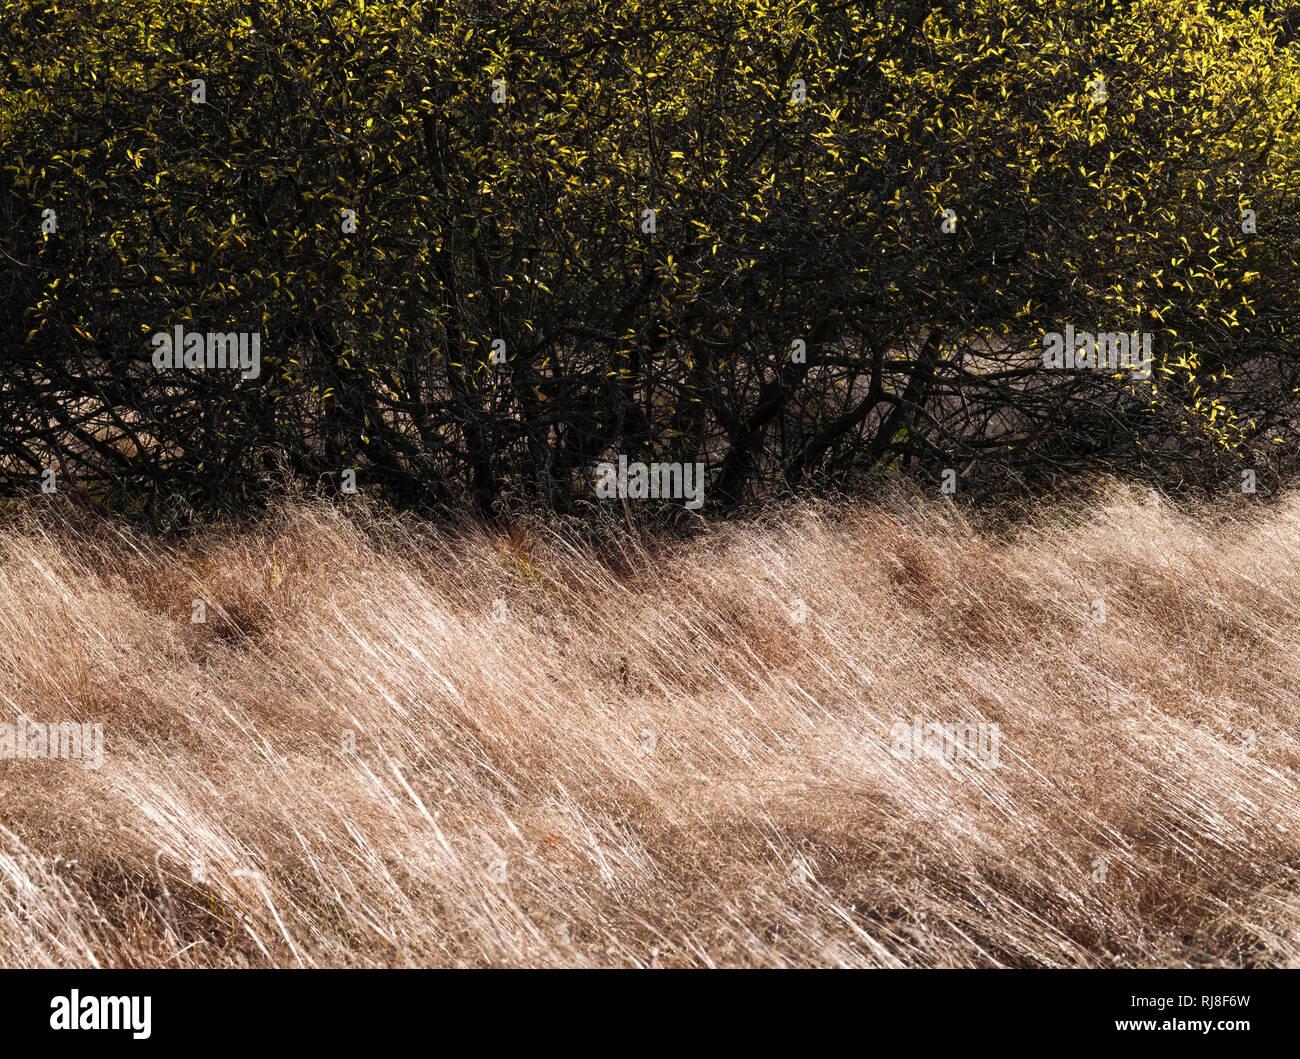 Deutschland, Bayern, Naturpark Bayrische Rhön, UNESCO-Biosphärenreservat, Naturschutzgebiet Schwarzes Moor, windgeformte Moorgräser, Salweiden Stock Photo